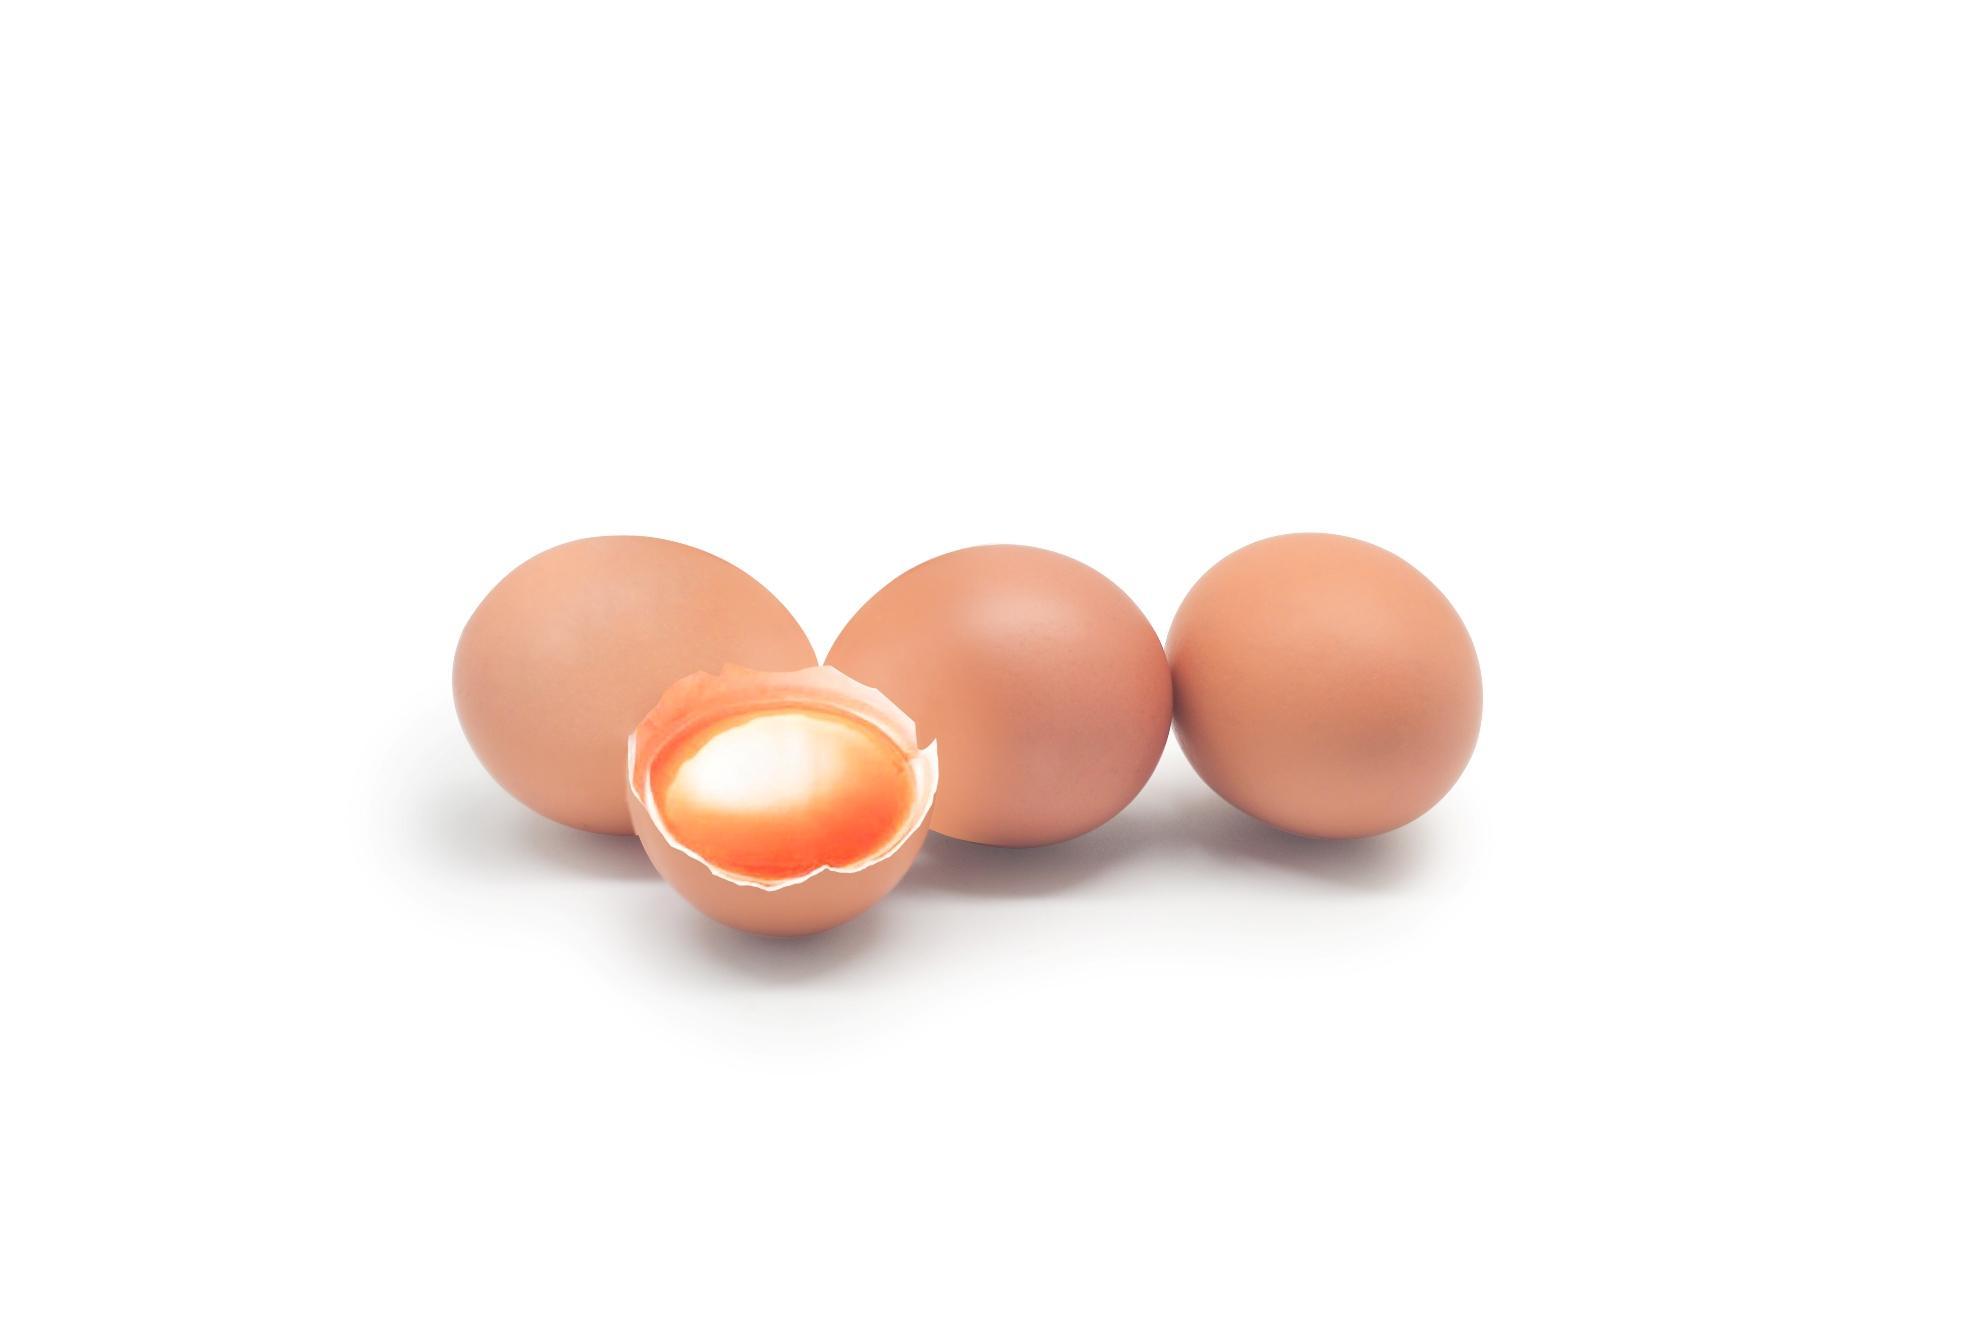 Telur Ayam Rendah Kolesterol Isi 10 Butir By Sajira Farm.